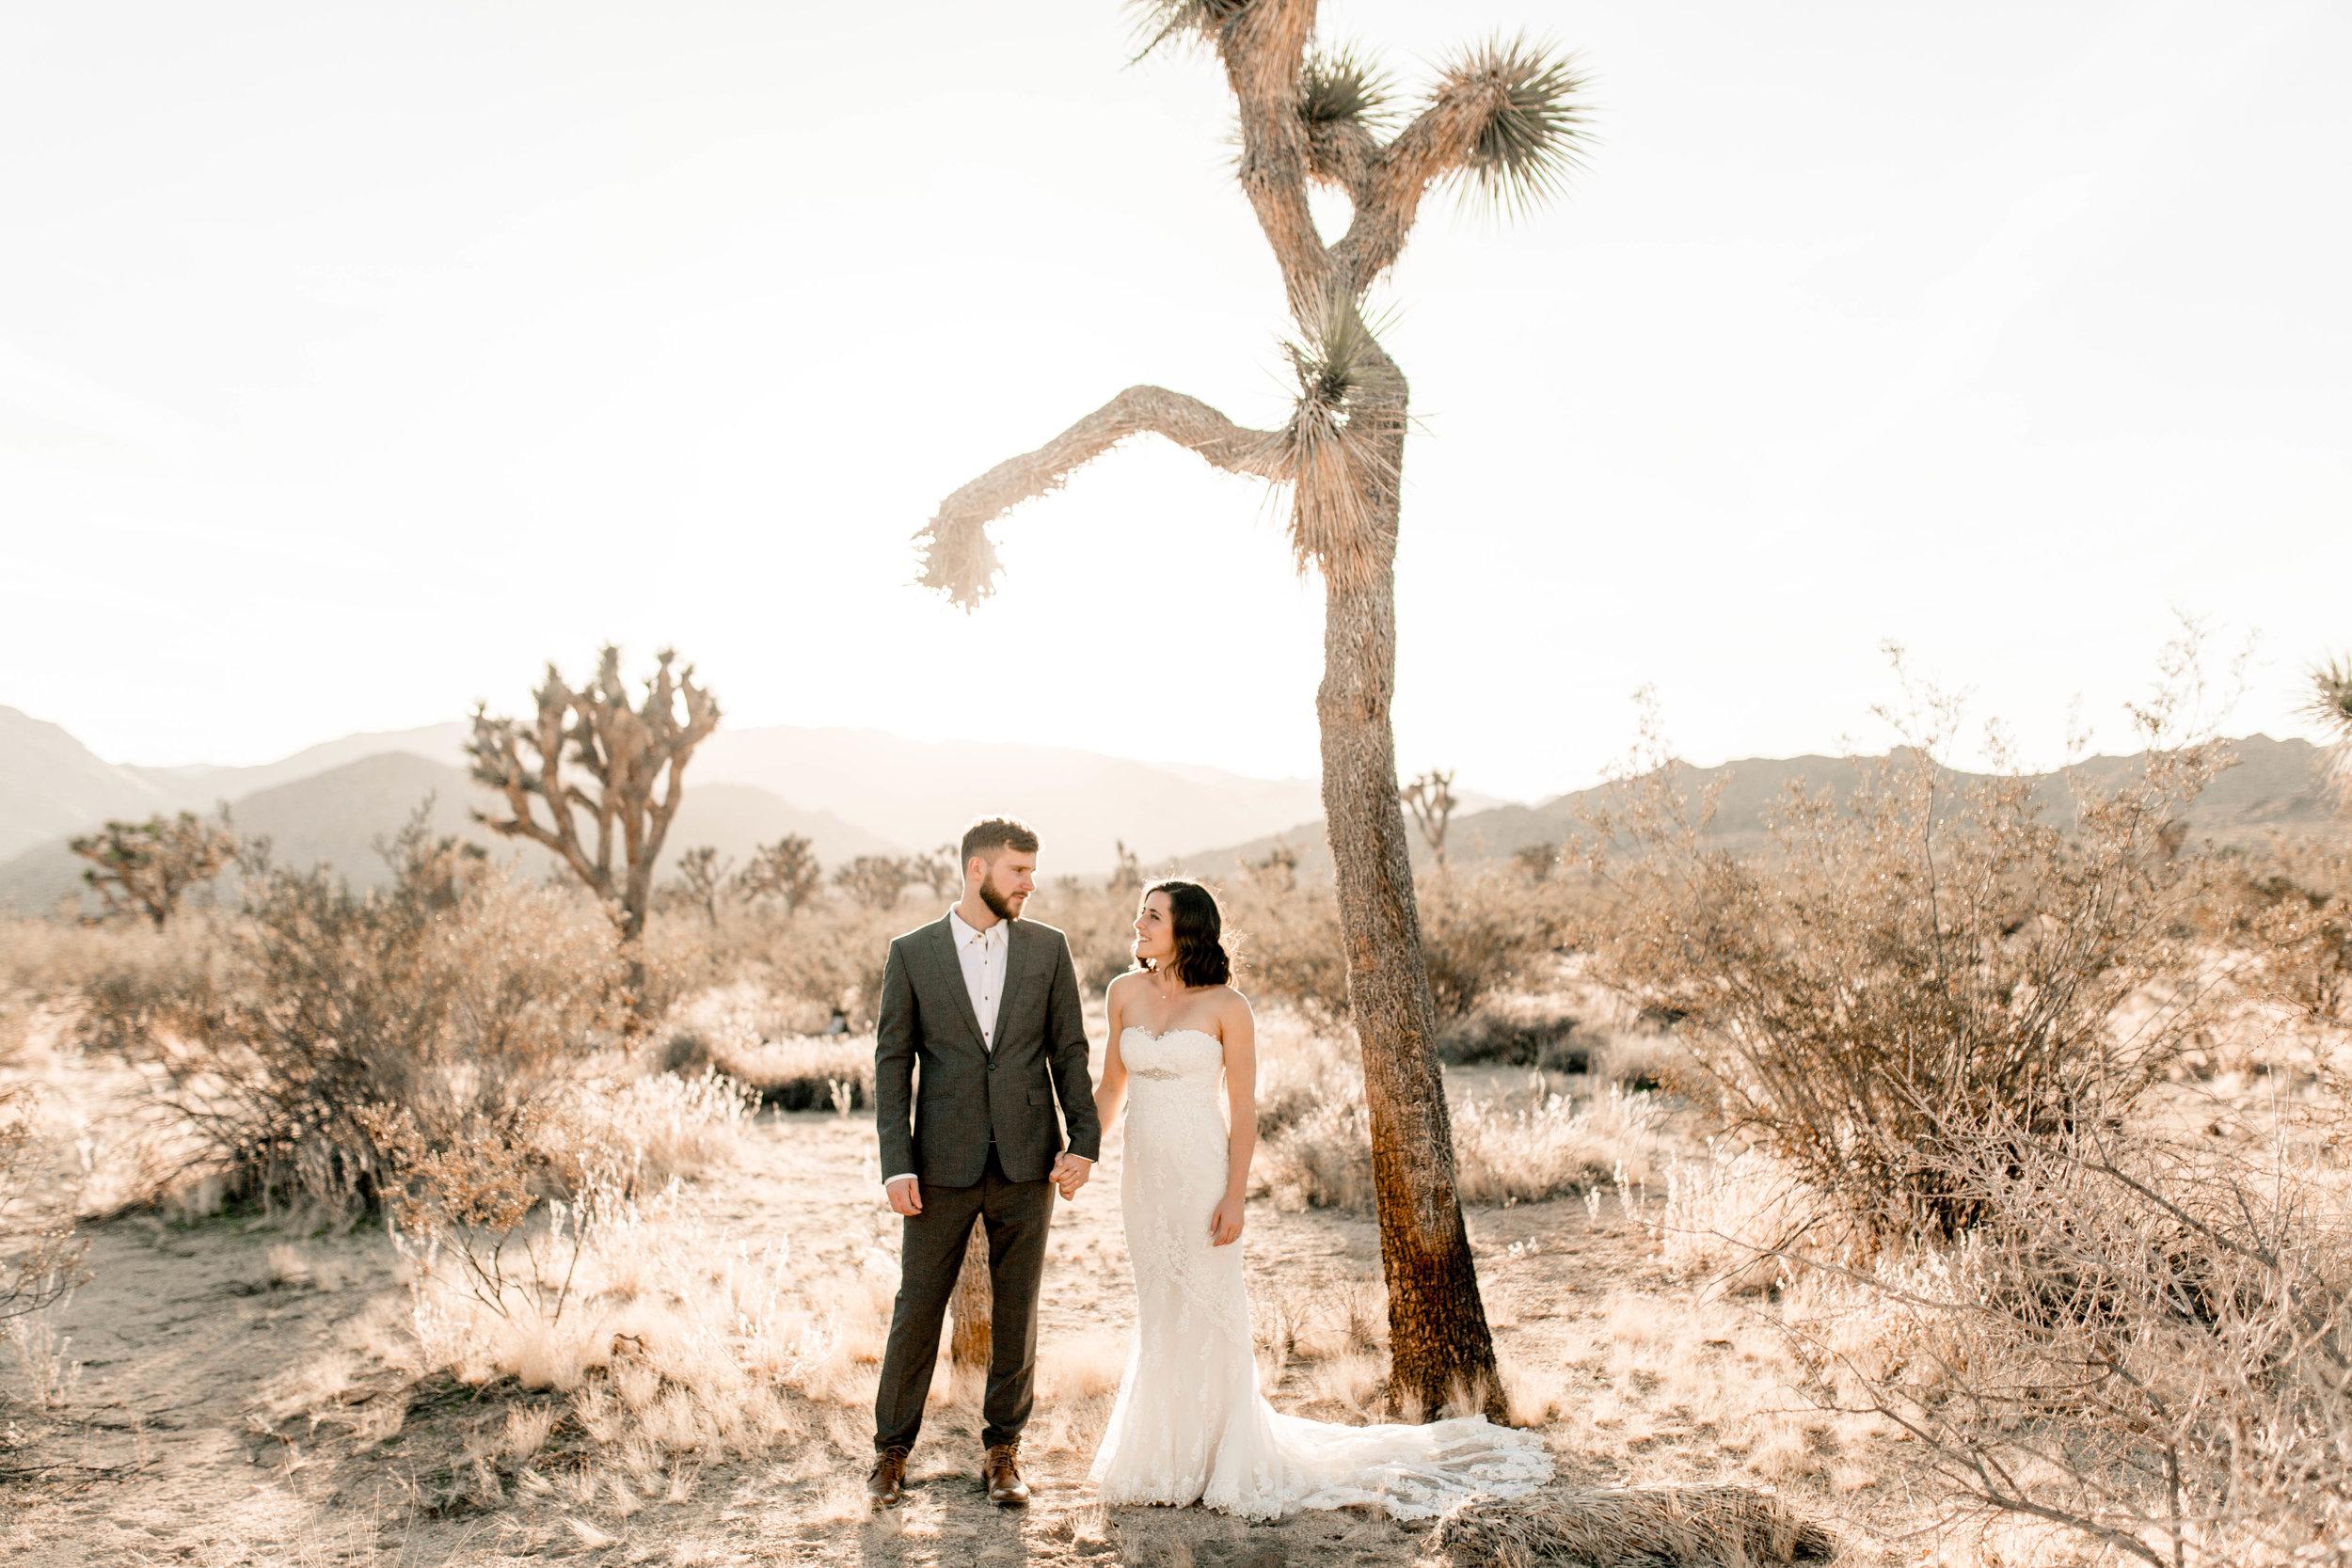 nicole-daacke-photography-joshua-tree-adventurous-elopement-wedding-national-park-wedding-photographer-adventure-wedding-adventurous-elopement-jtree-joshua-tree-national-park-wedding-photographer-intimate-weddings-golden-desert-love-7.jpg